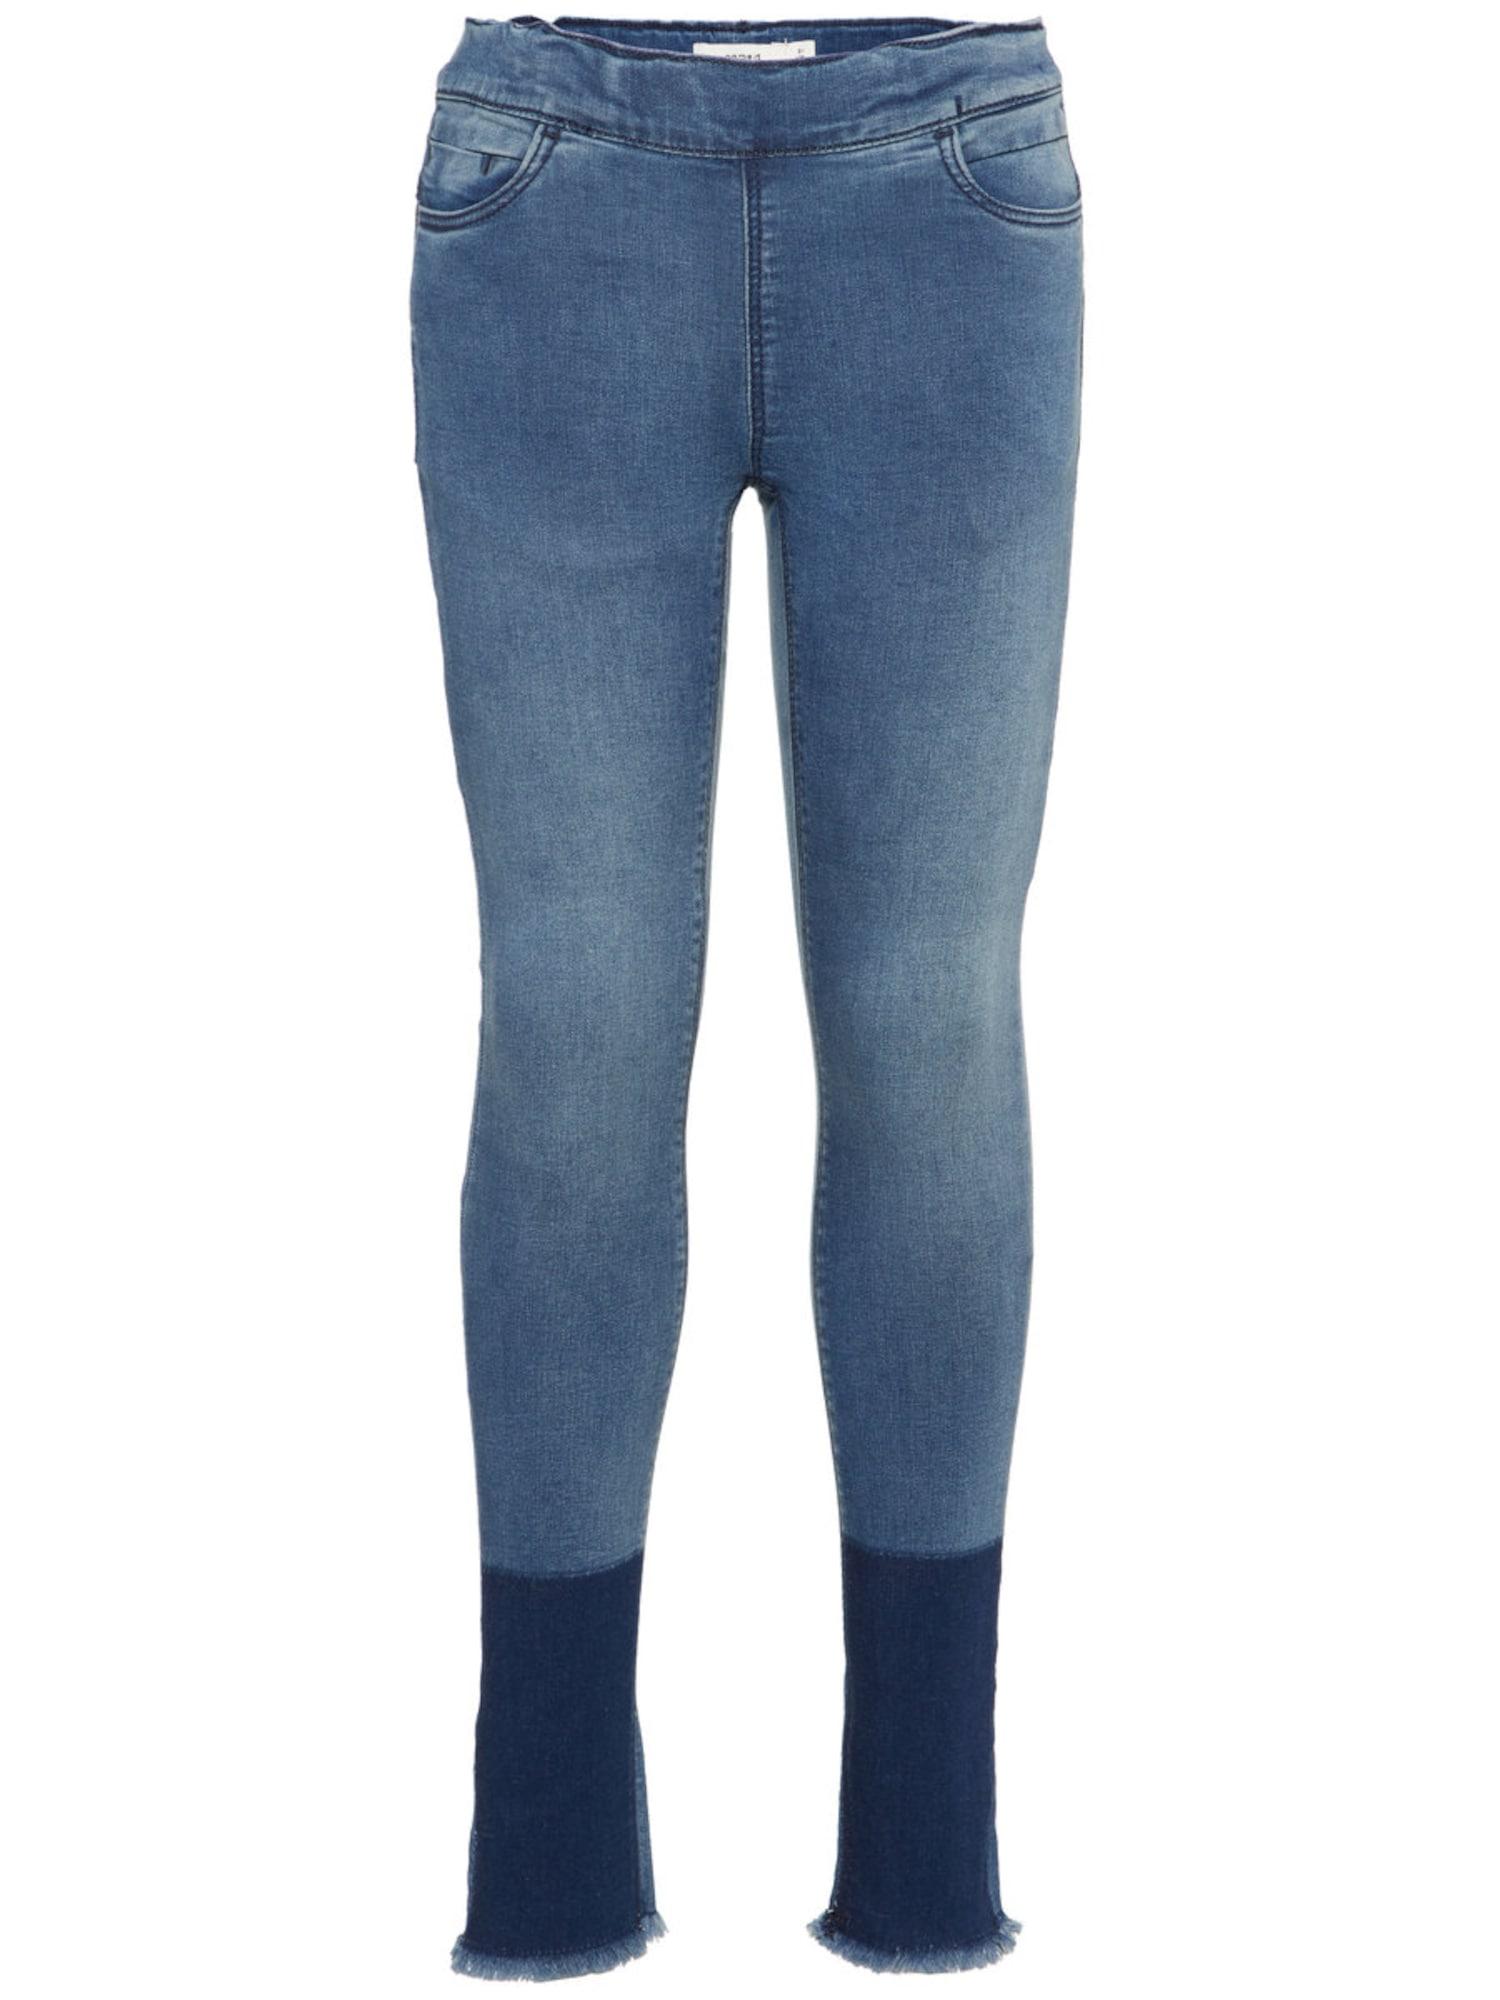 NAME IT Kids Skinny Fit Superstretch Legging Blauw